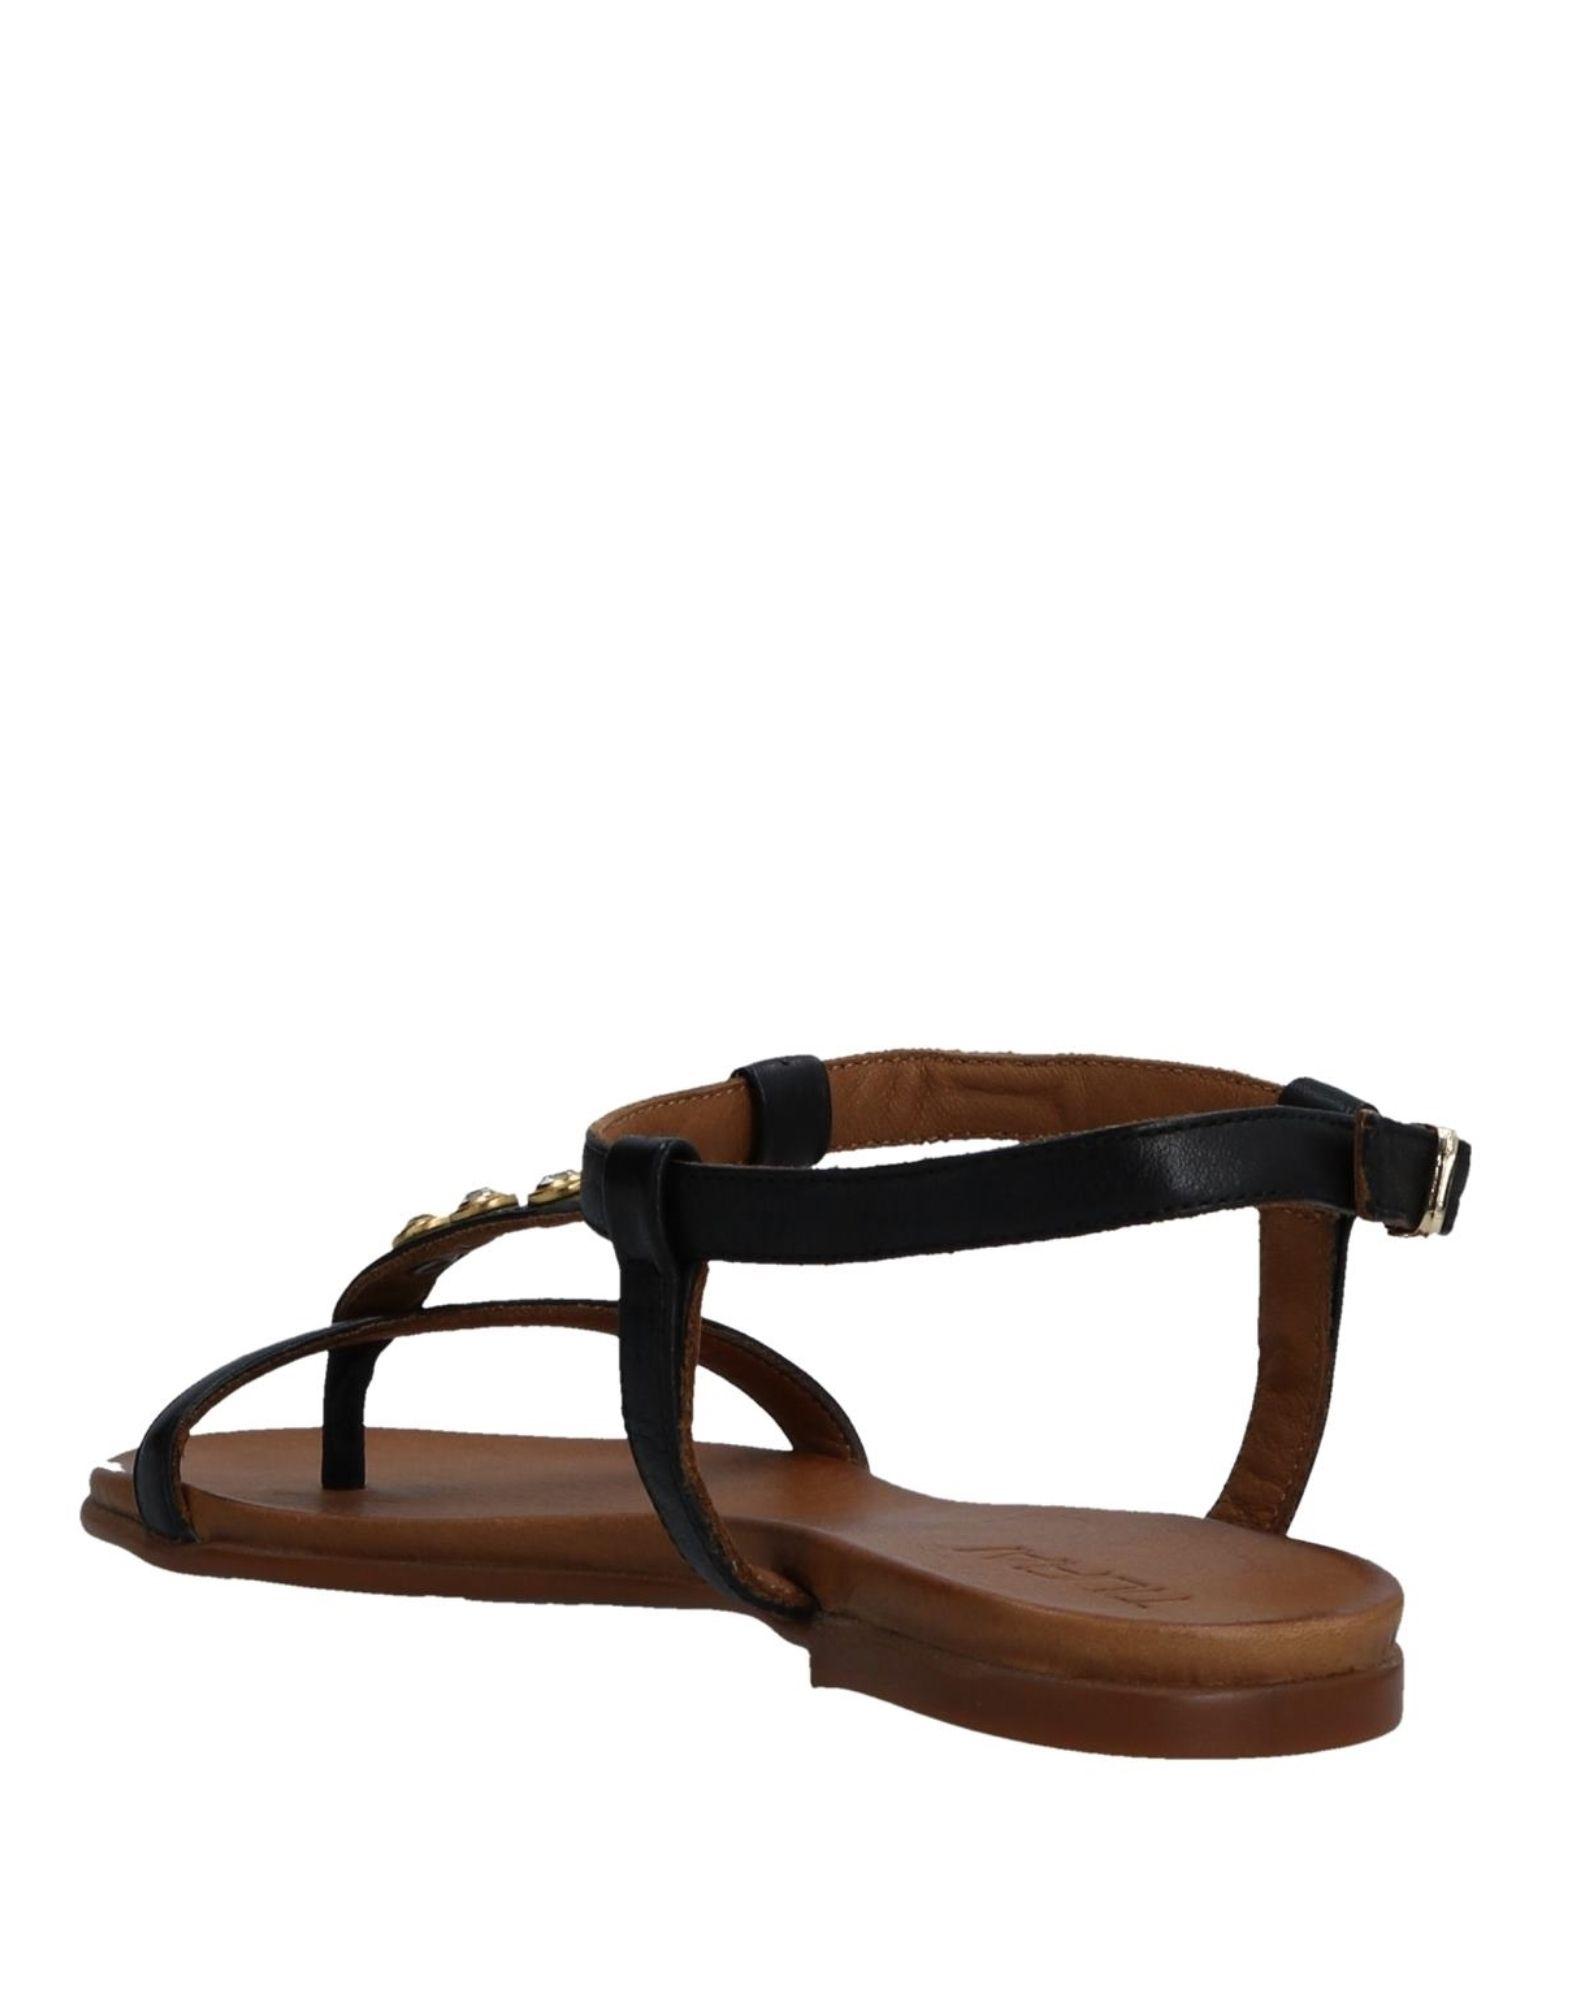 Tiurai Gute Dianetten Damen  11527588JW Gute Tiurai Qualität beliebte Schuhe 97a0c4